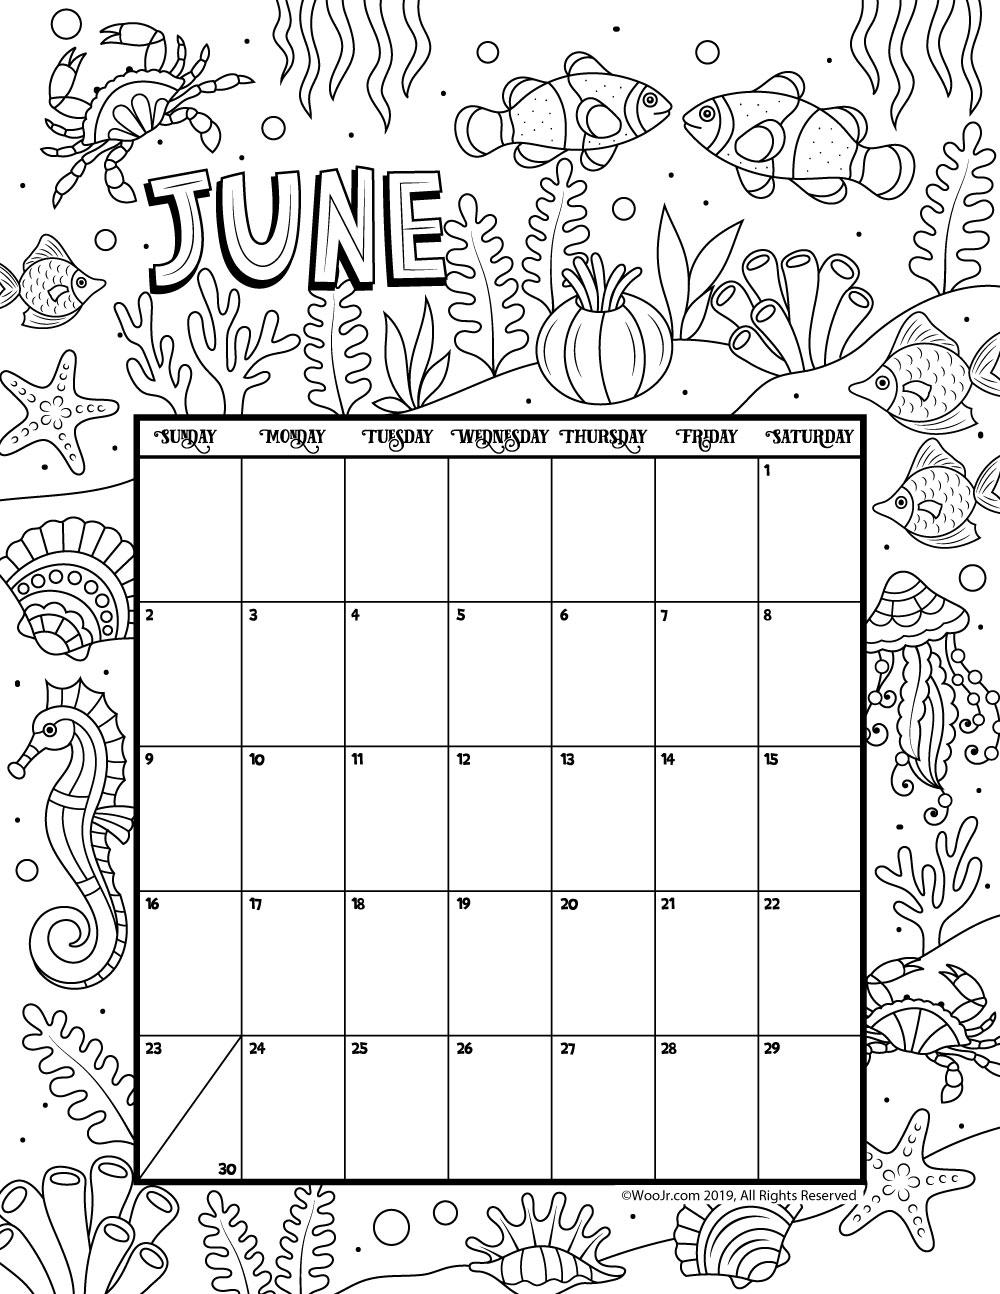 June 2019 Coloring Calendar | Woo! Jr. Kids Activities